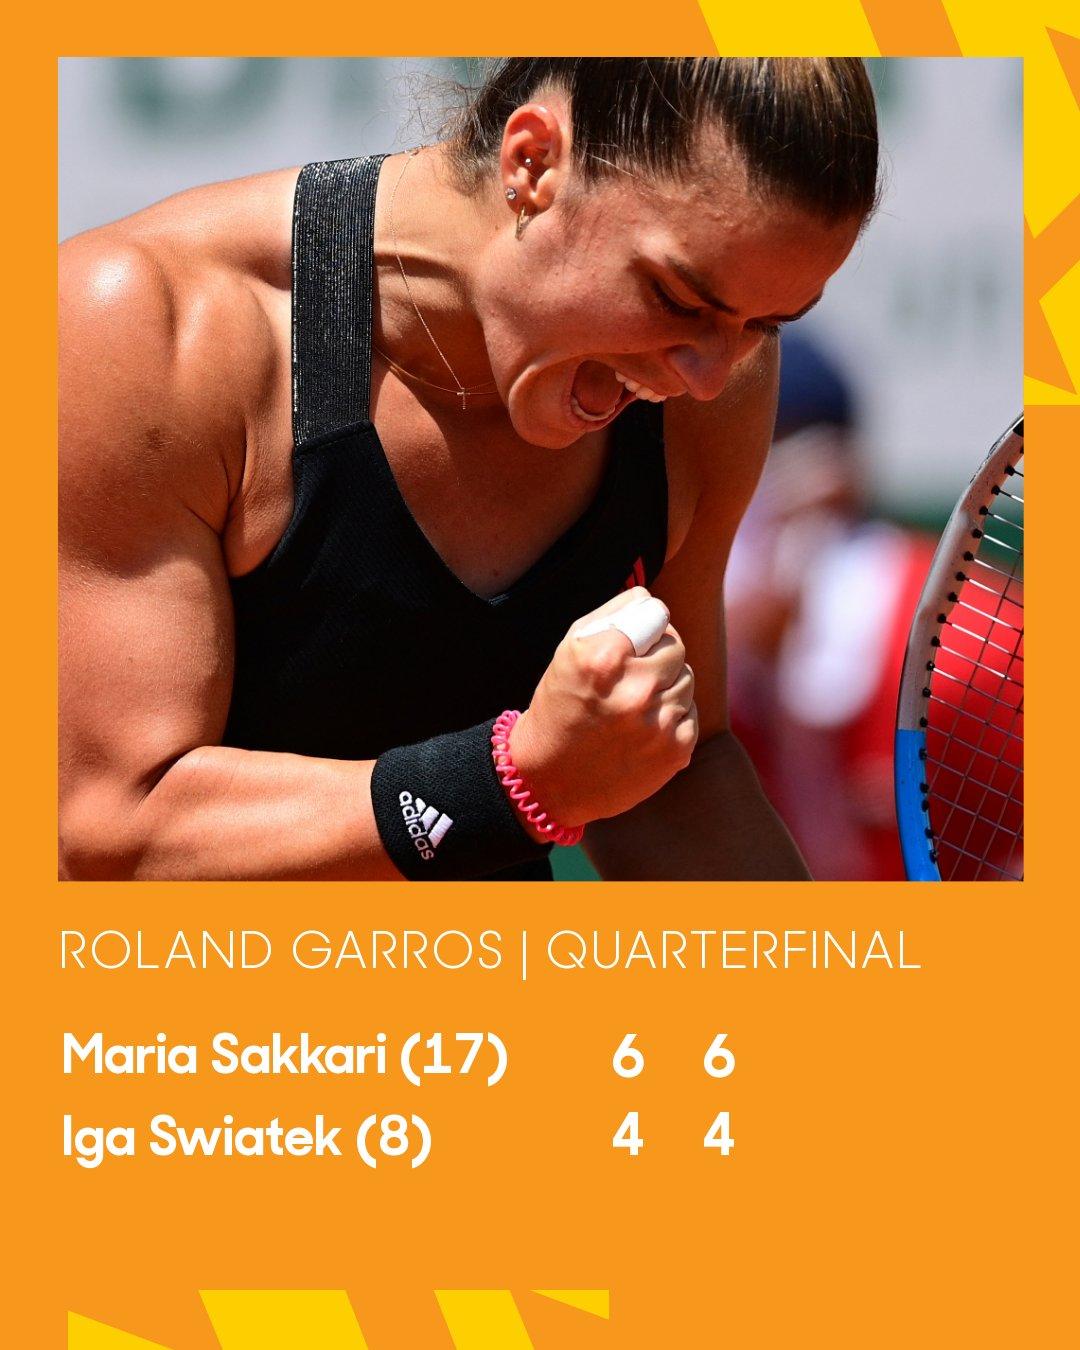 Greece's Maria Sakkari reacts during her women's singles quarter-final tennis match against Poland's Iga Swiatekon Day 11 of The Roland Garros 2021 French Open tennis tournament in Paris on June 9, 2021.